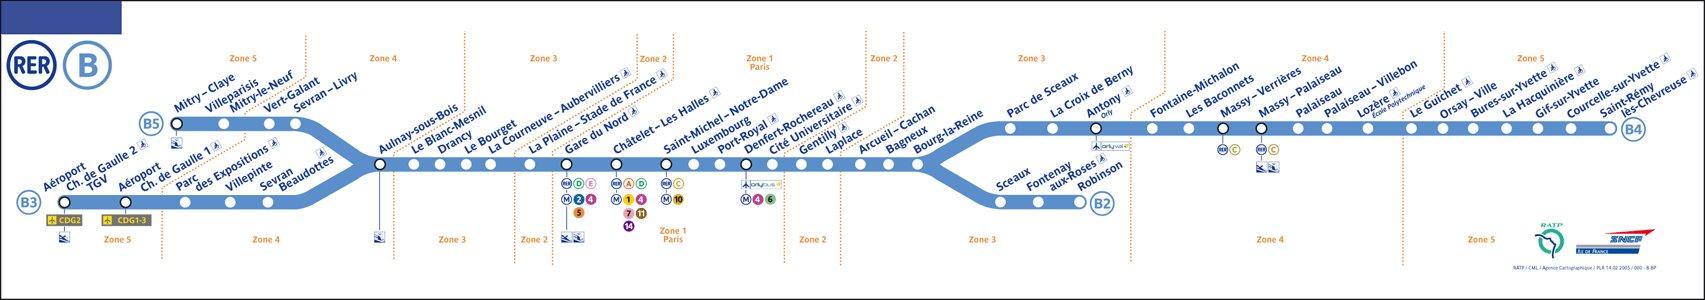 B Line Subway Map.Misc Subway Metro Tube Maps Page 26 Skyscrapercity